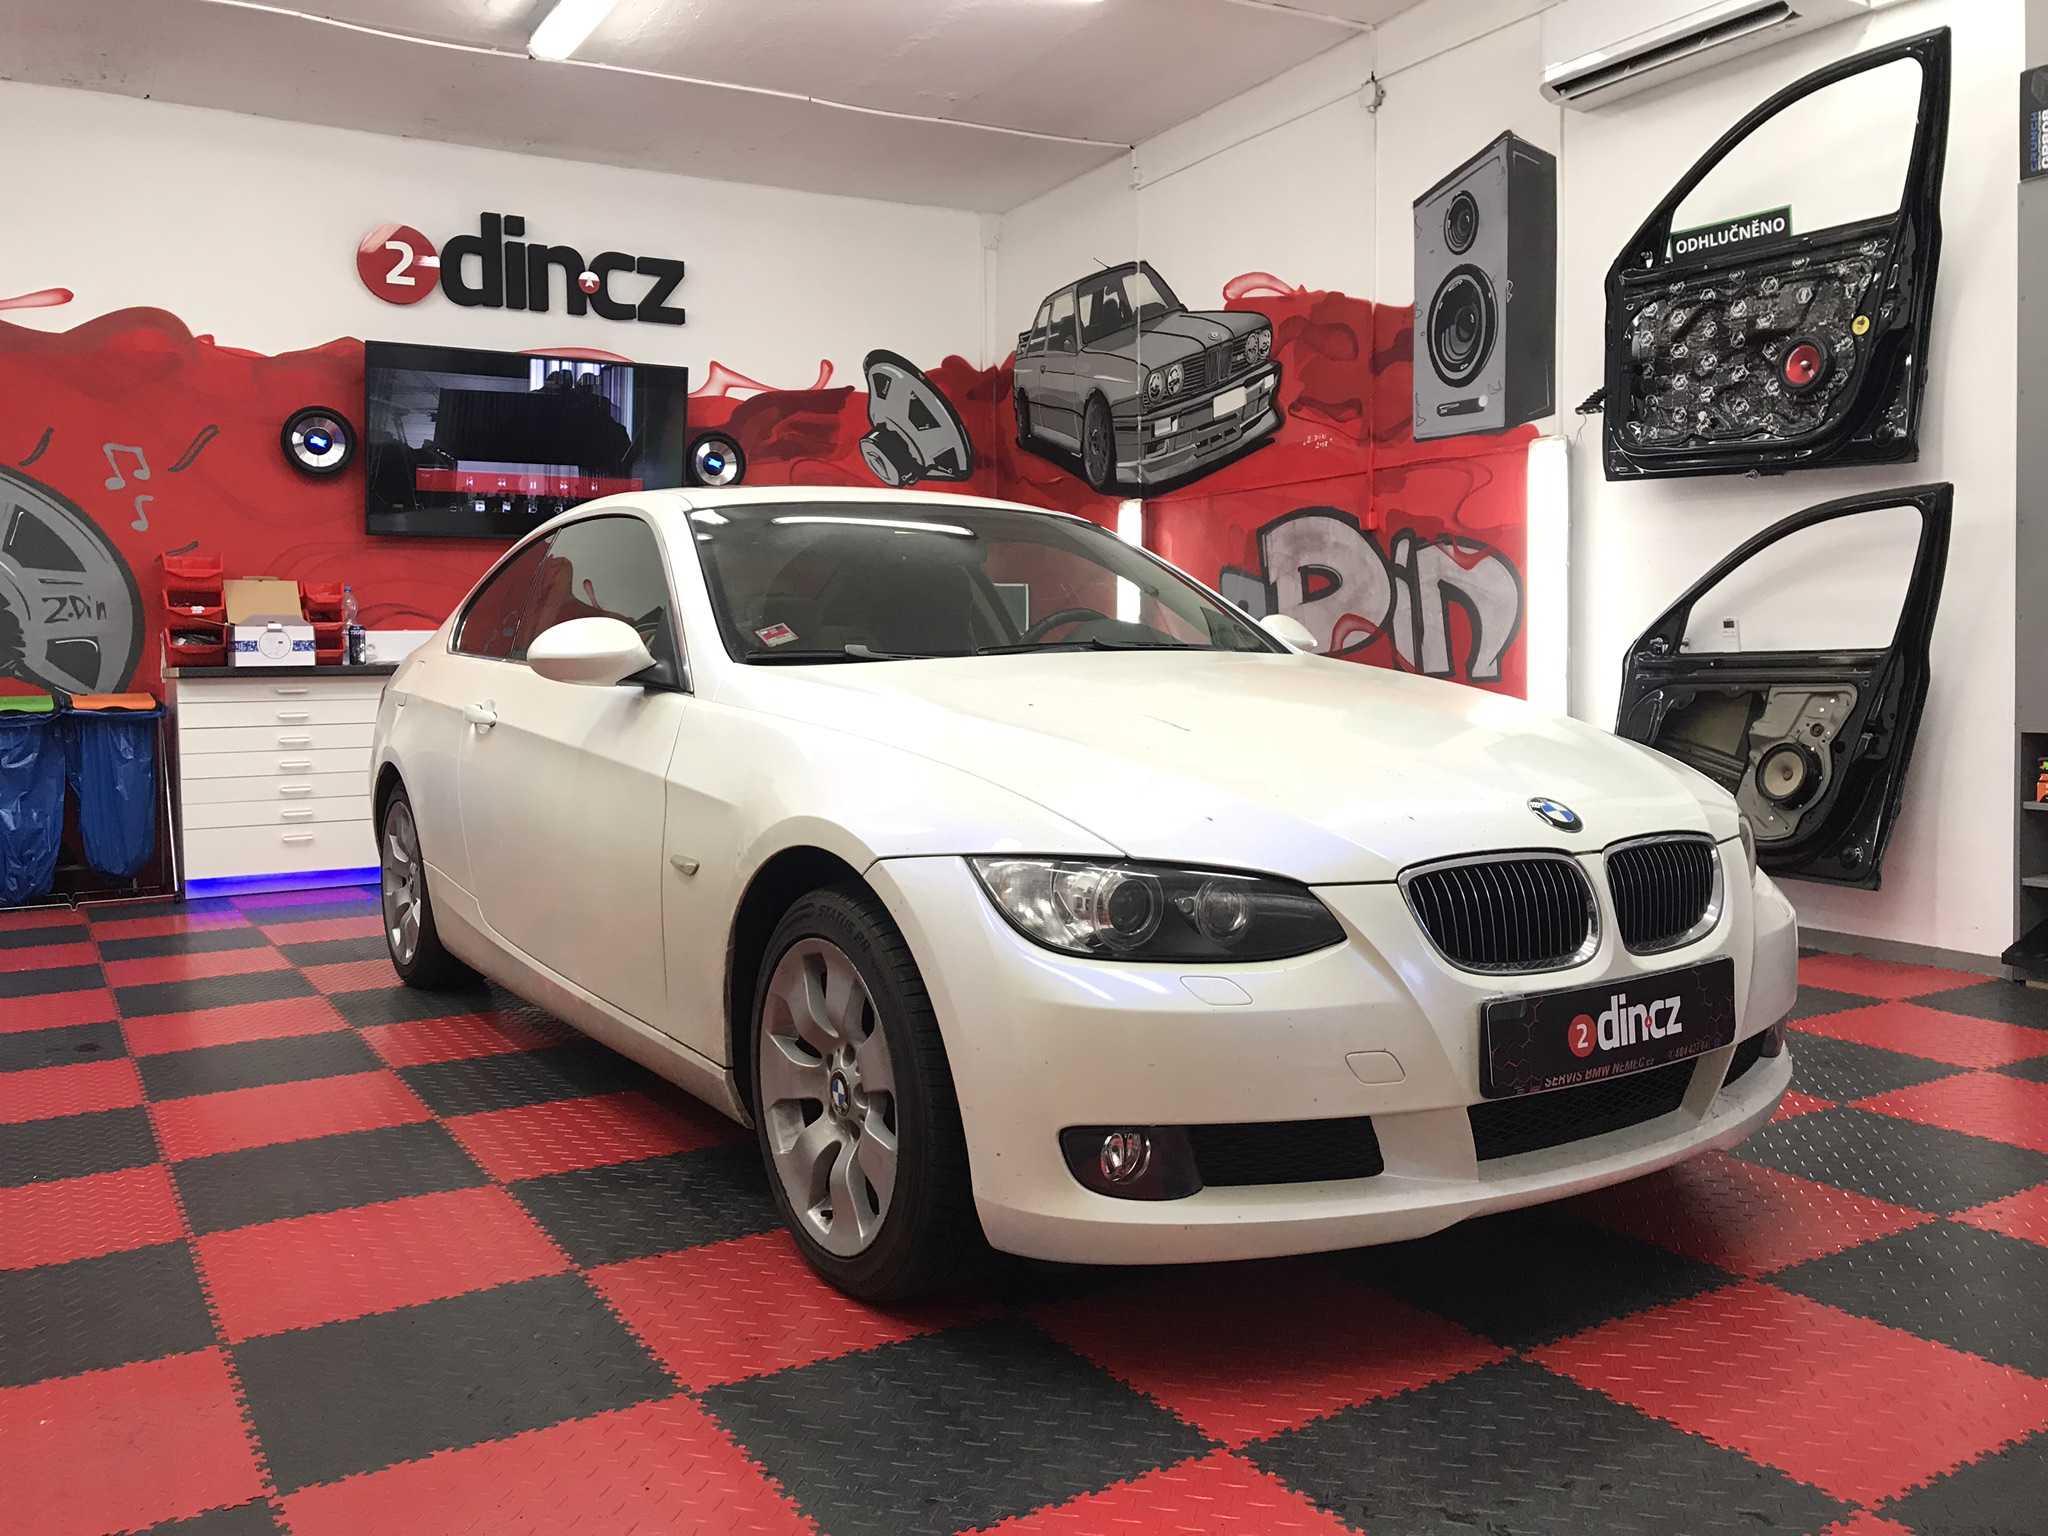 BMW e92 - Výměna autorádia, montáž kamery a Apple CarPlay